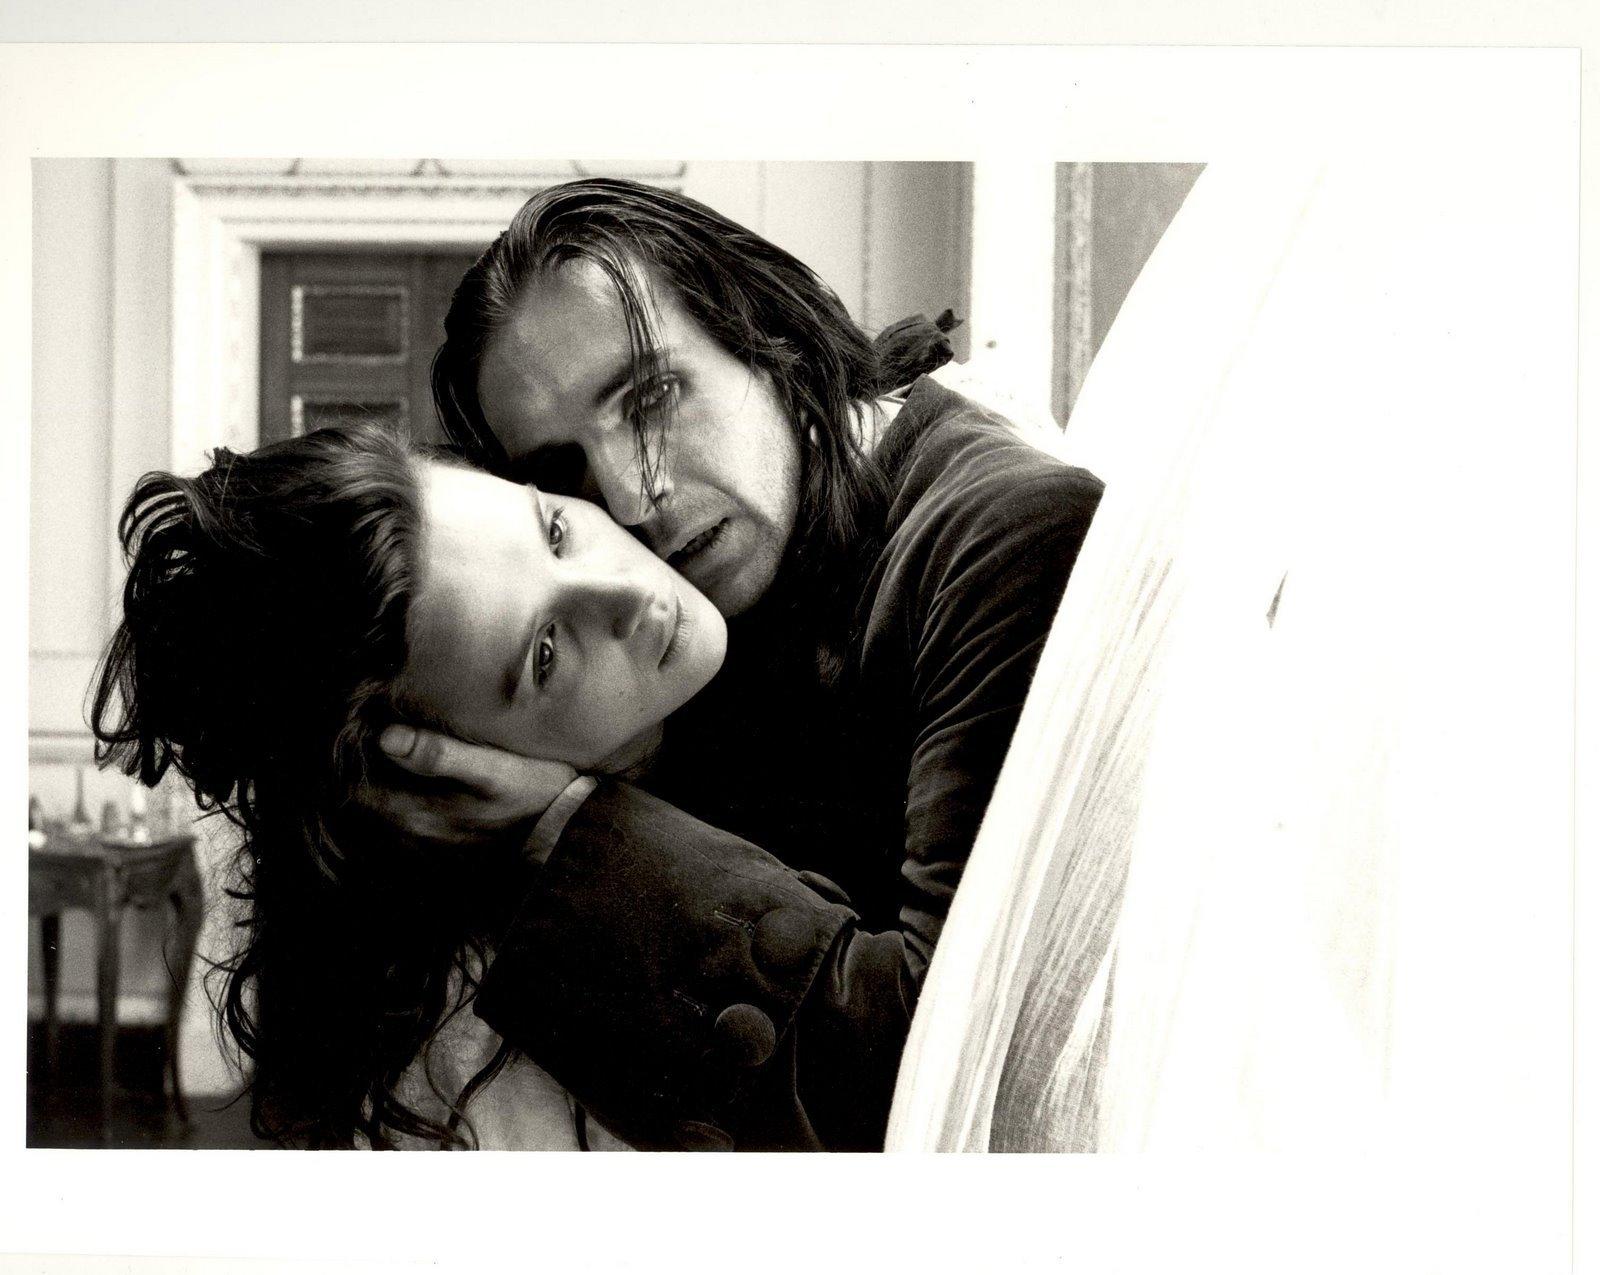 Wuthering Heights - binoche, Ralph Fiennes - Juliette ...